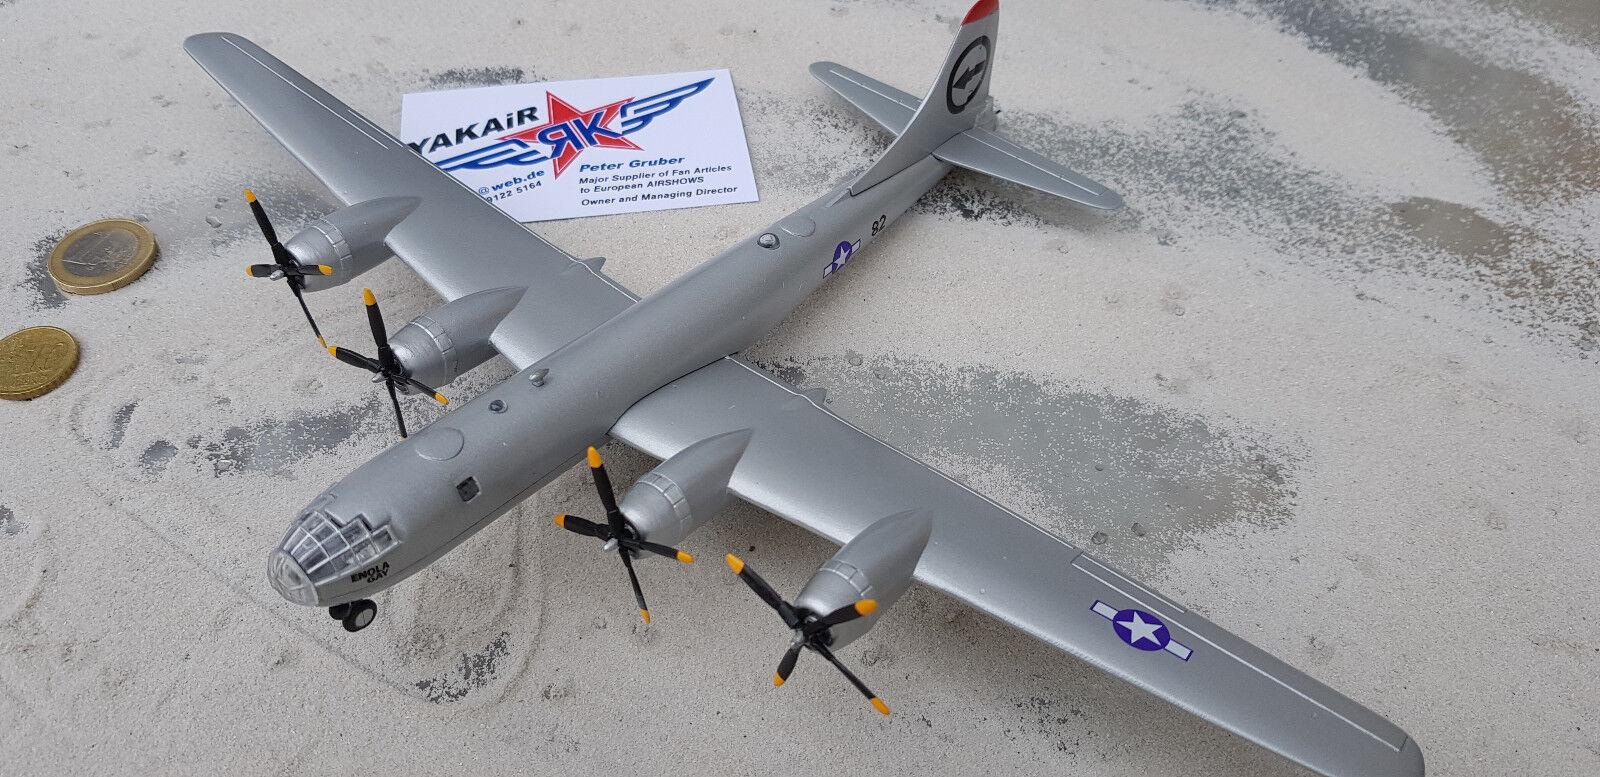 Boeing B - 29 Superfortress Superfortress Superfortress 1944 atlas listo modelo avion Aircraft yakair 1 144 126cec